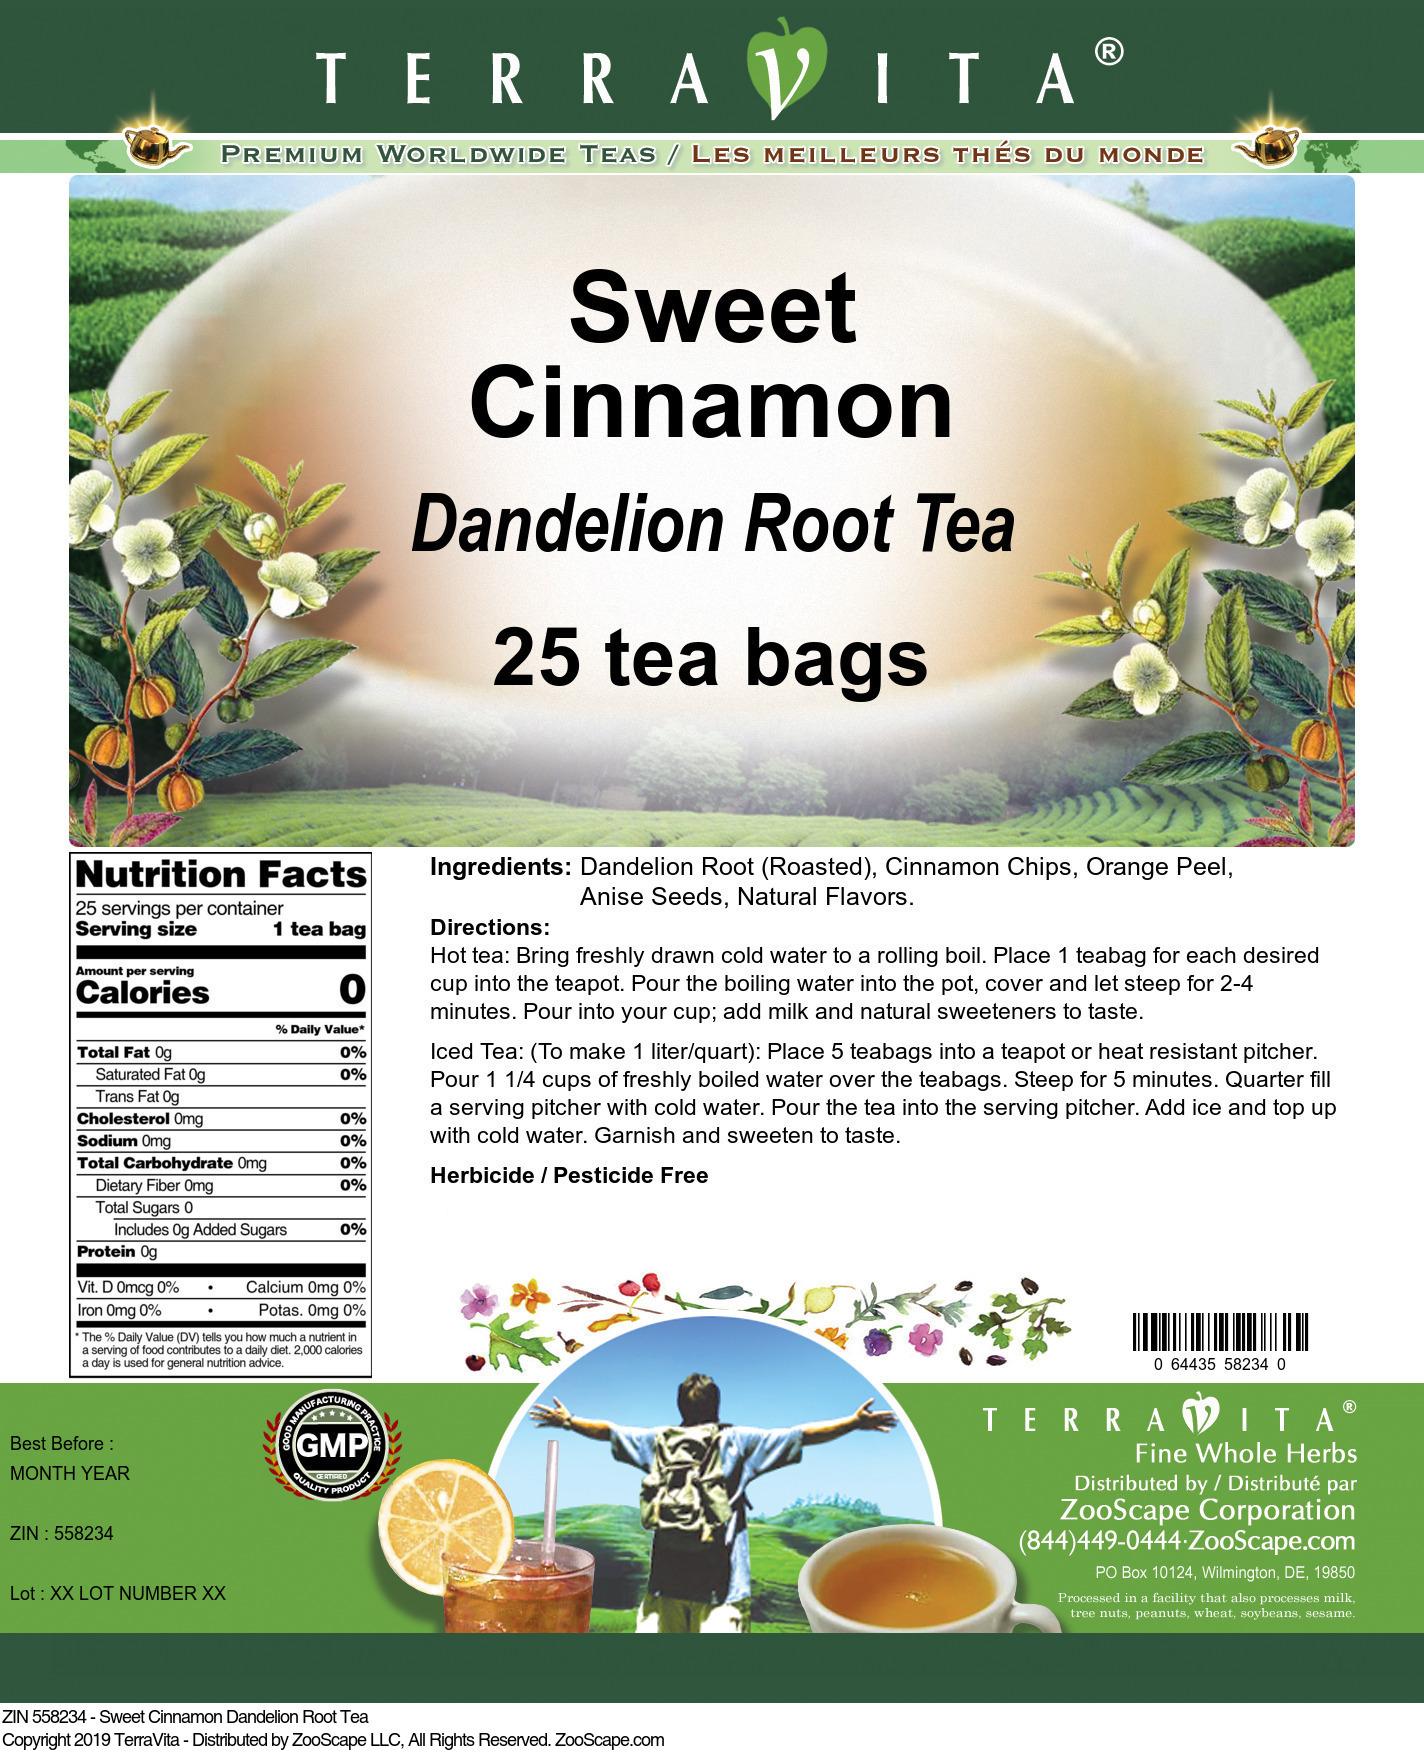 Sweet Cinnamon Dandelion Root Tea